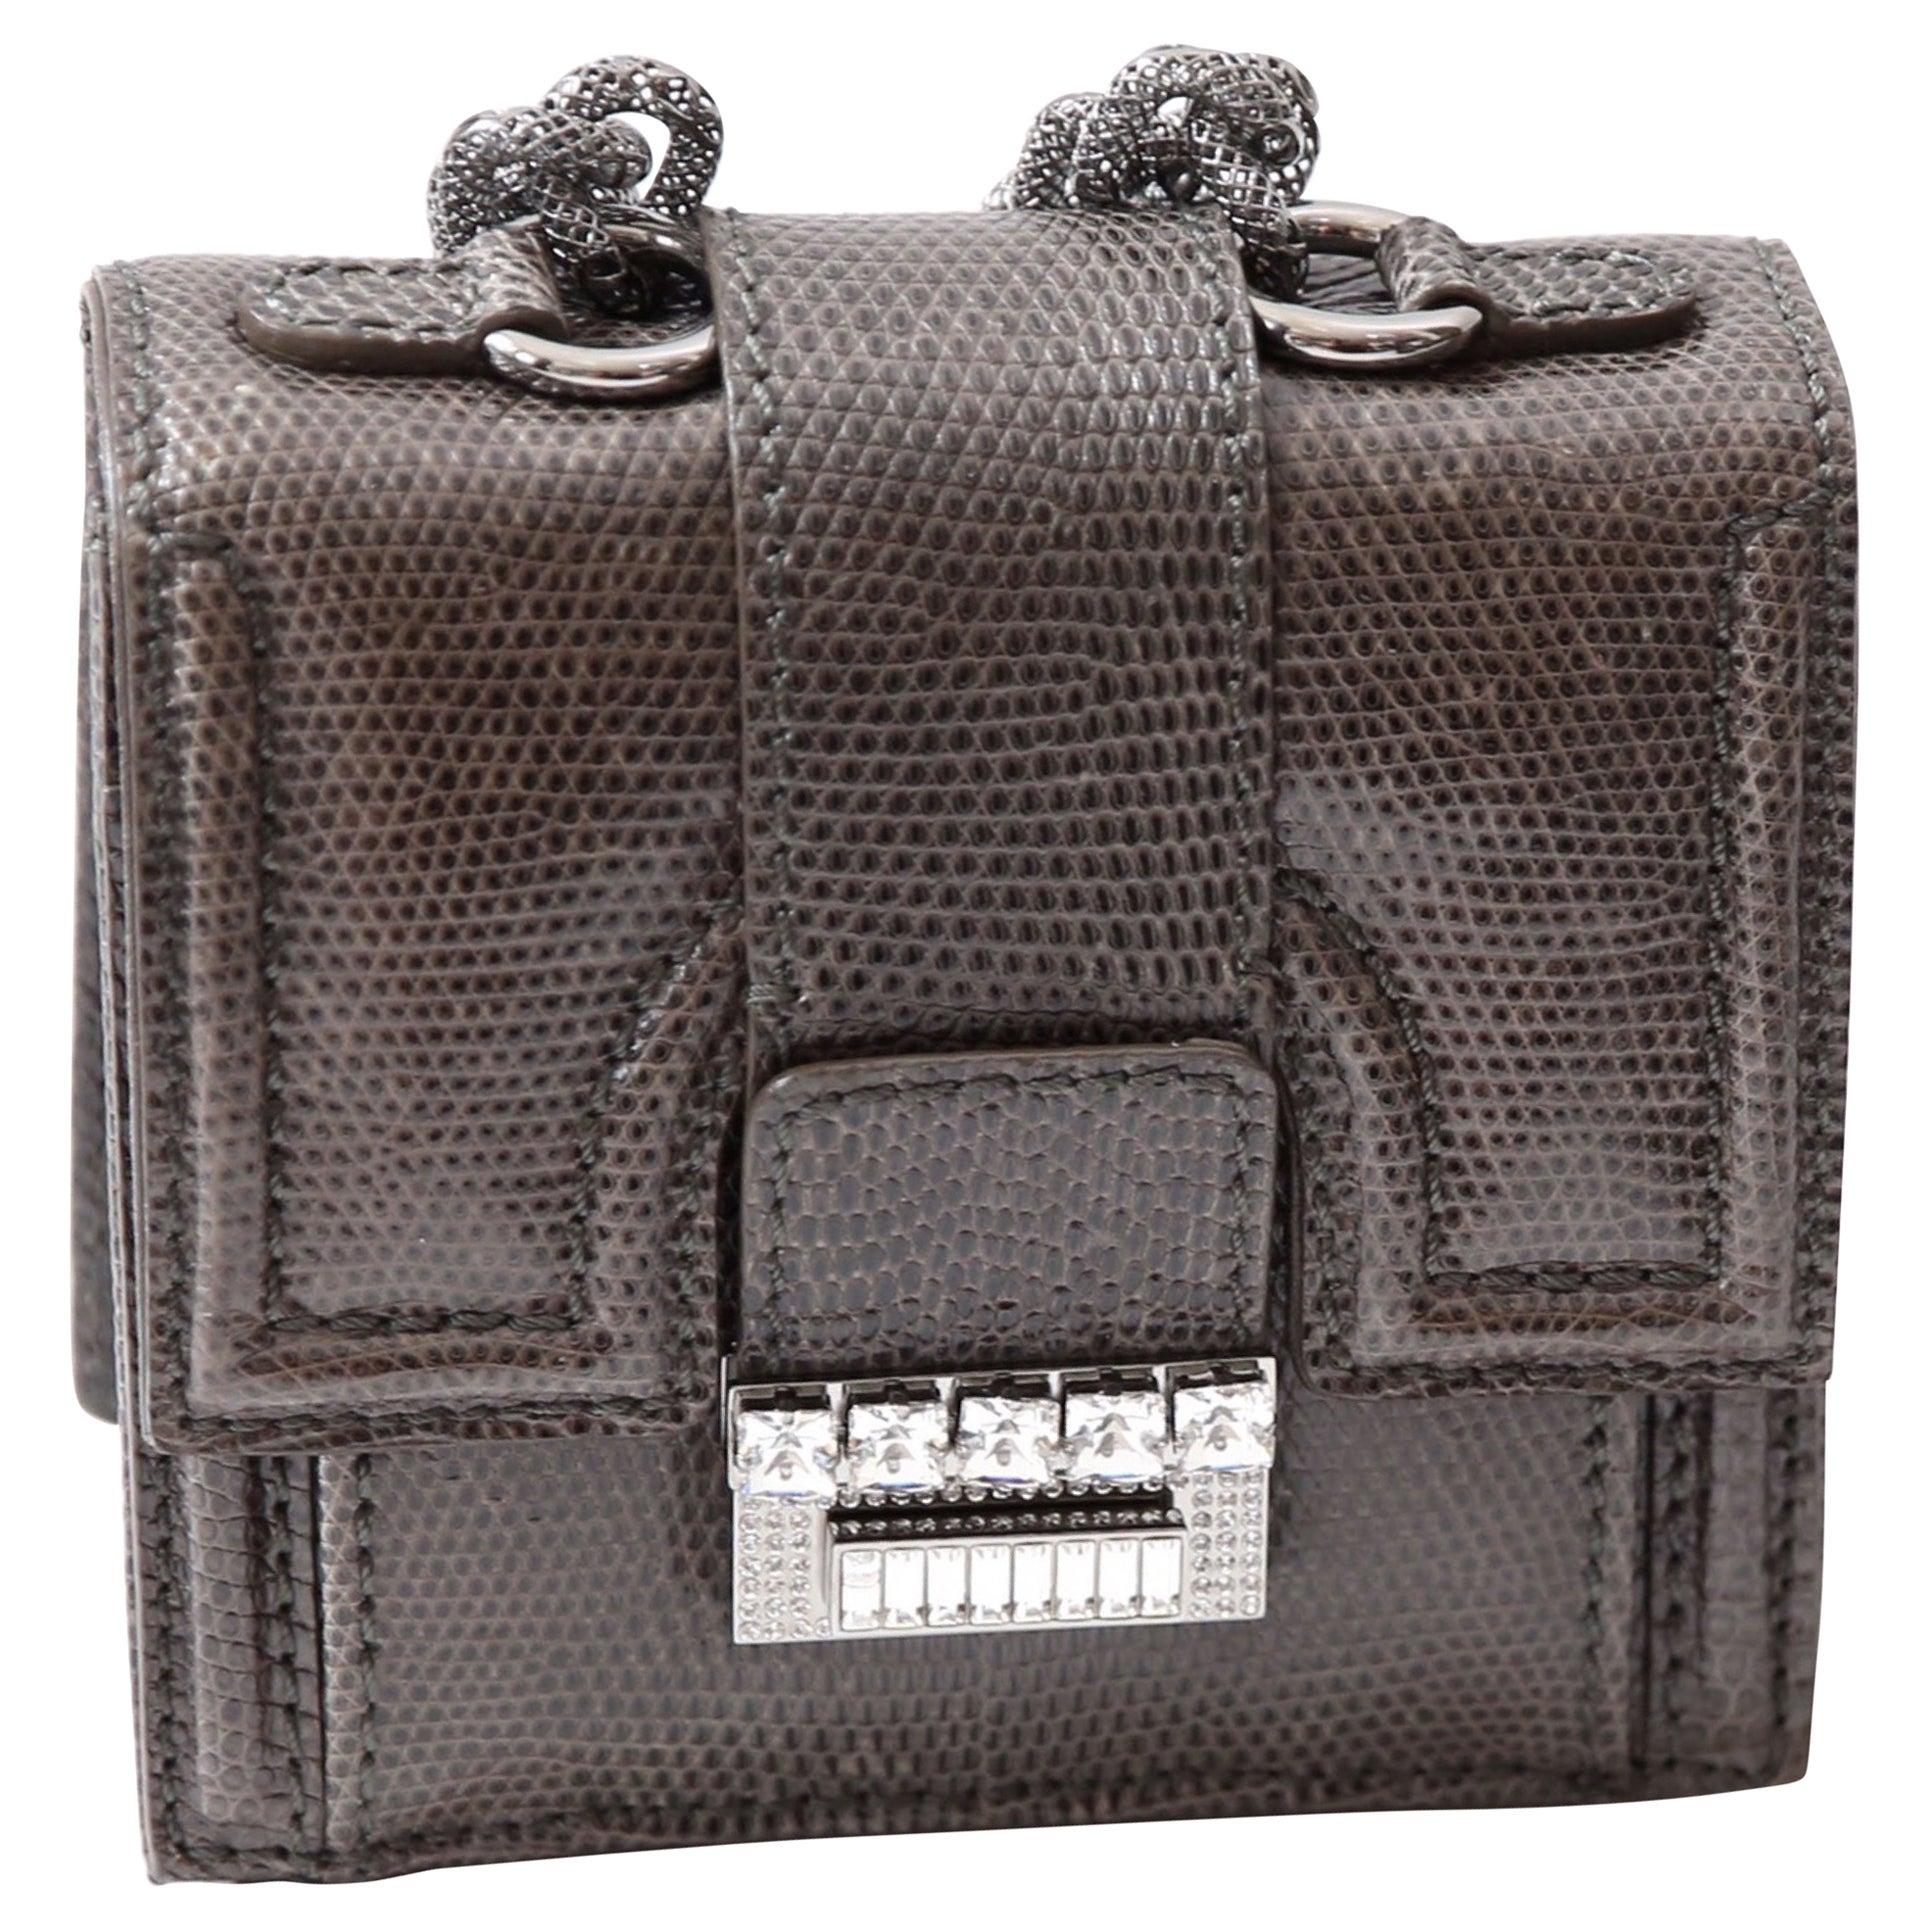 Valentino vintage mini crystal embellished lizard chain wristlet clutch bag